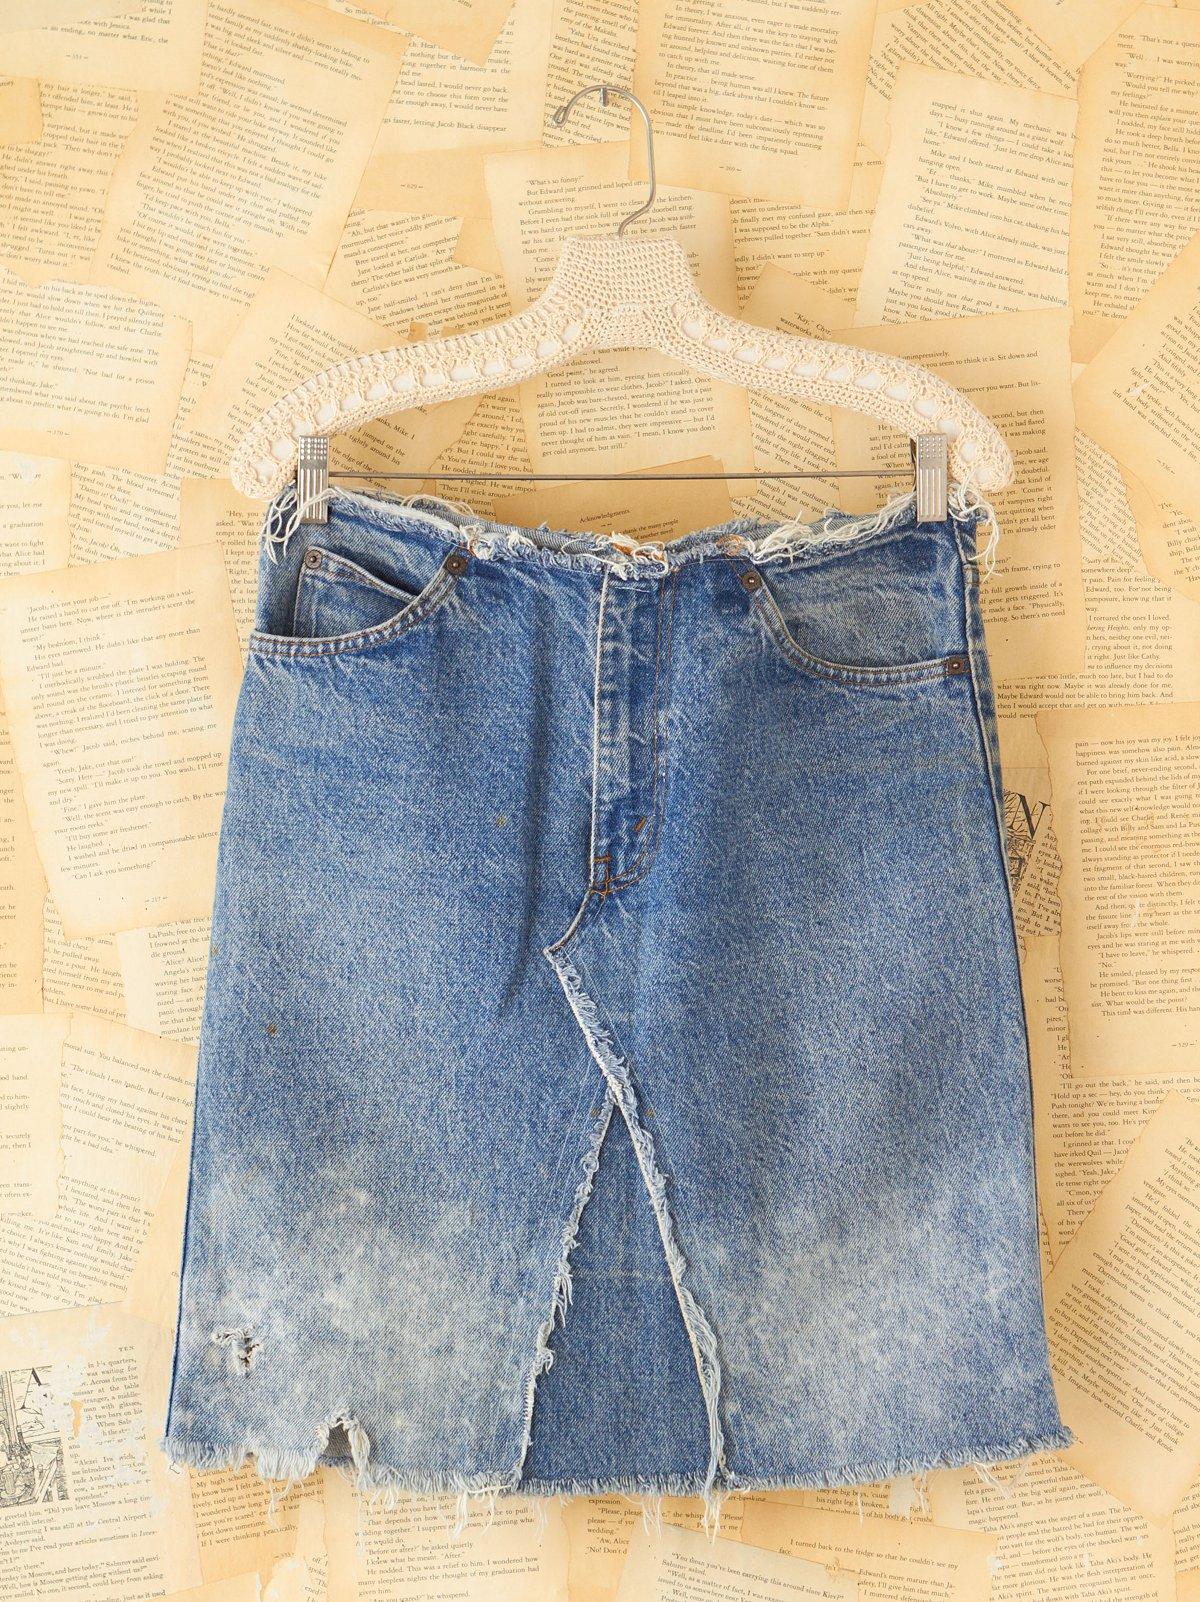 Vintage Frayed Denim Skirt